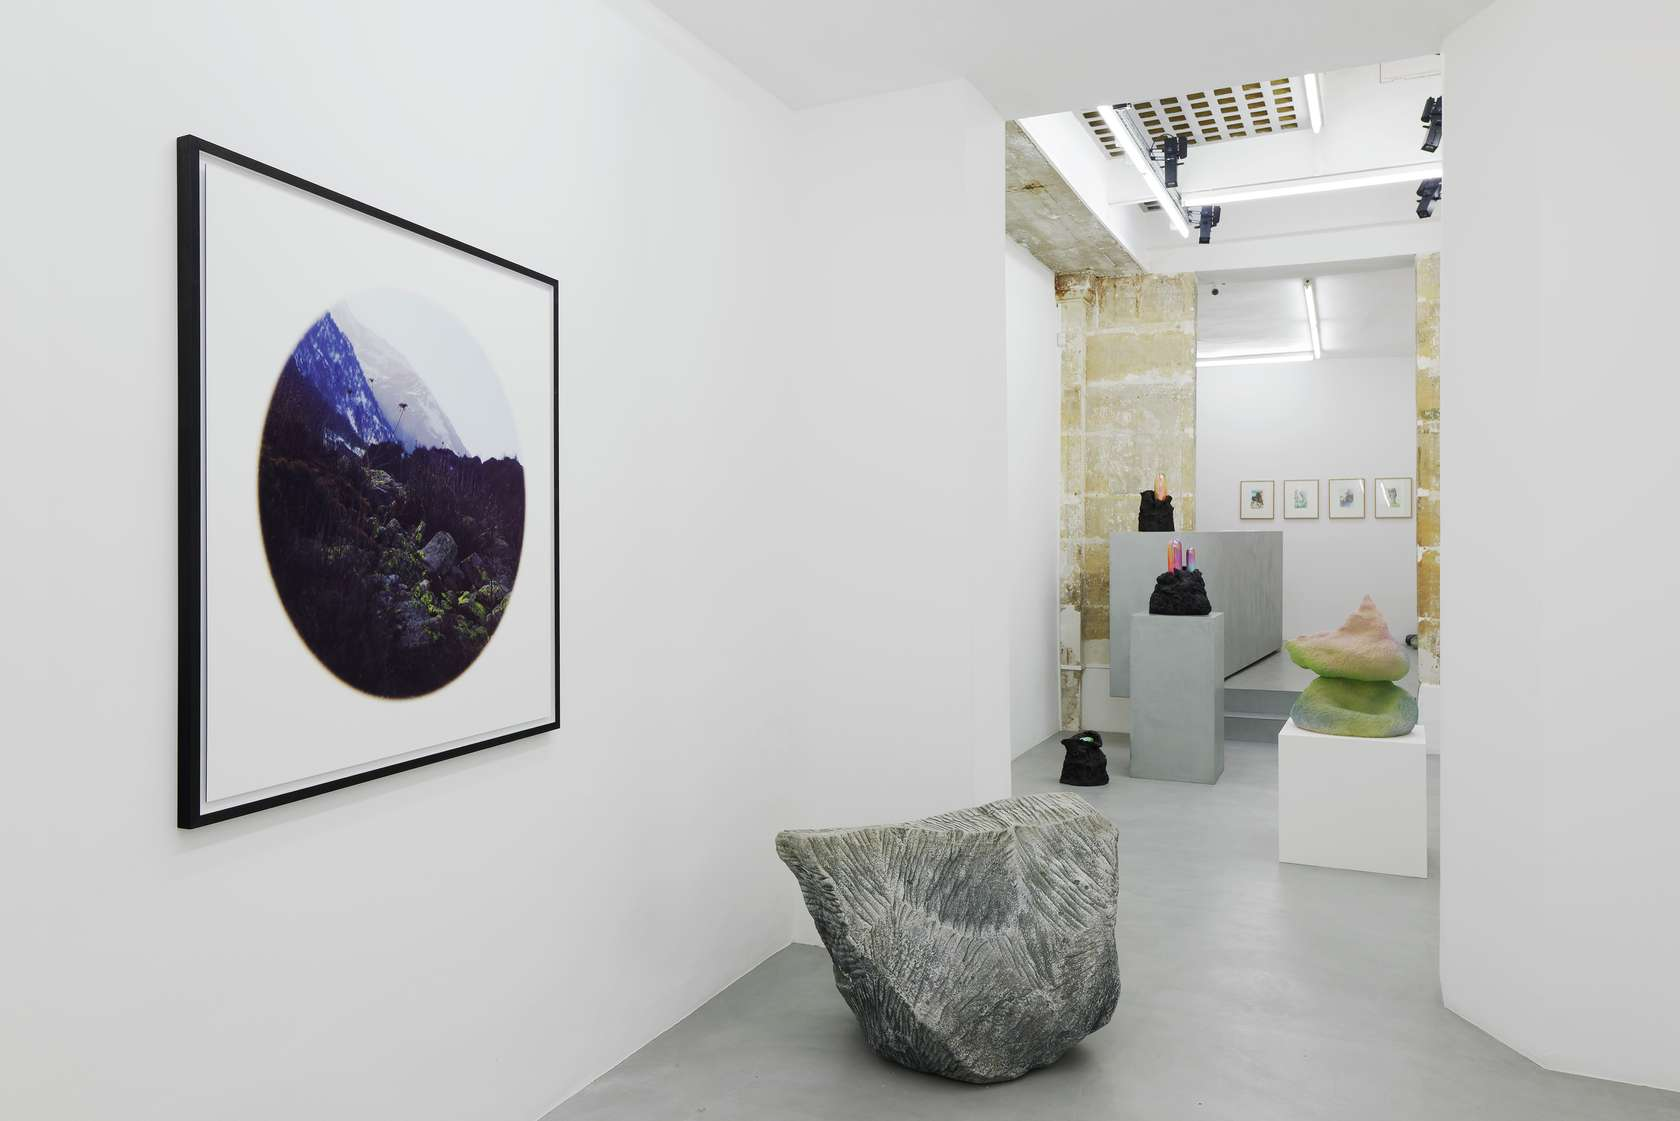 Salvatore Arancio, Piero Gilardi & Abraham Poincheval, Rock Garden 6 janvier  — 17 février 2018